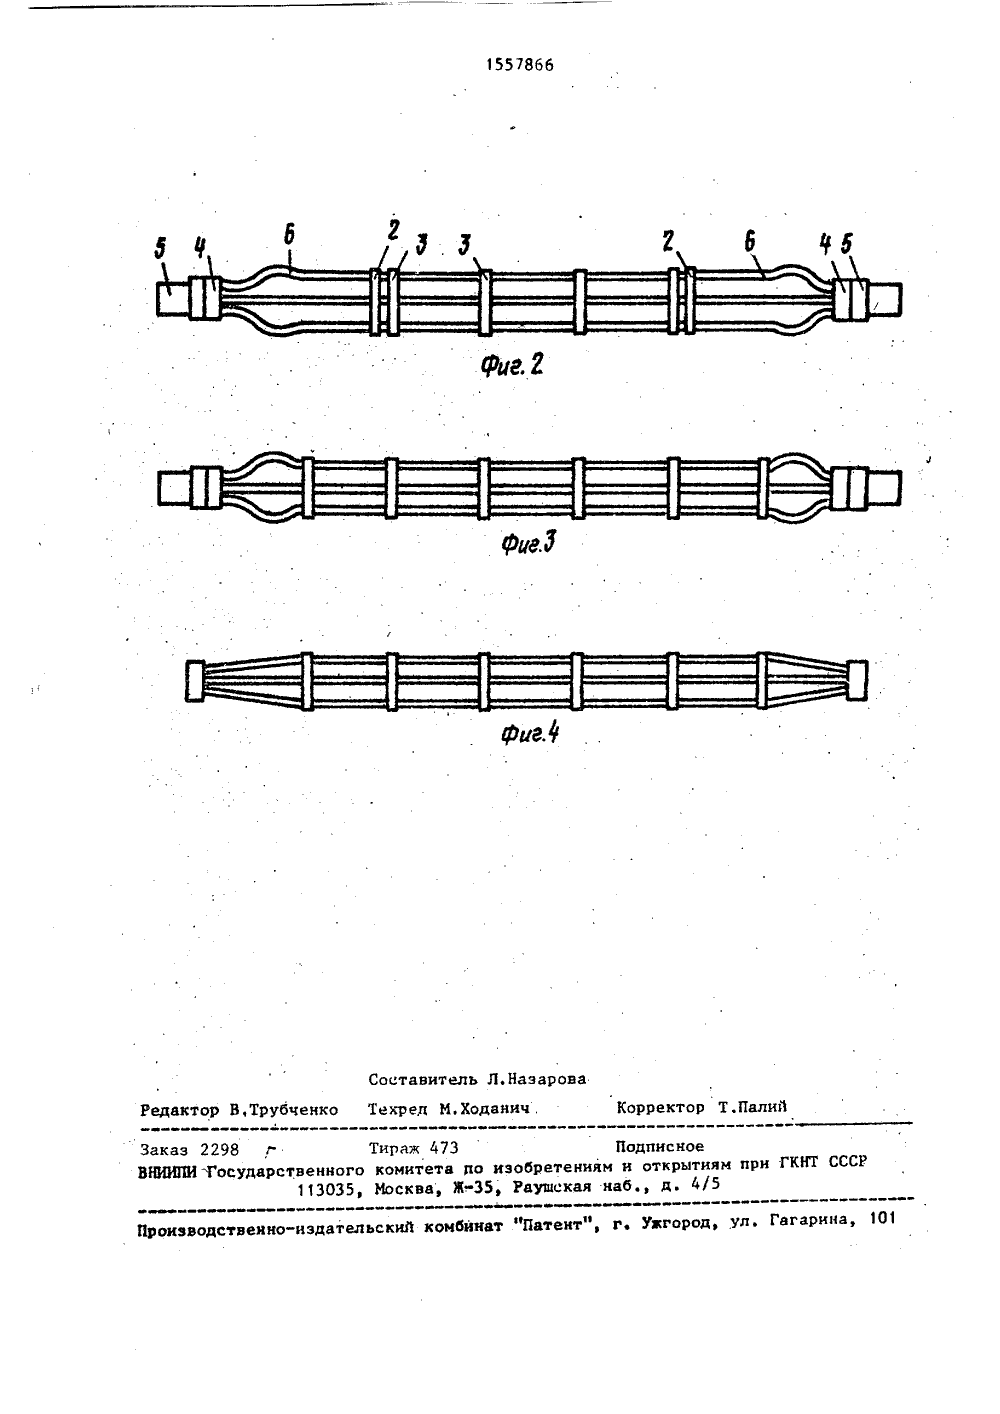 Пластины теплообменника КС 82 Улан-Удэ